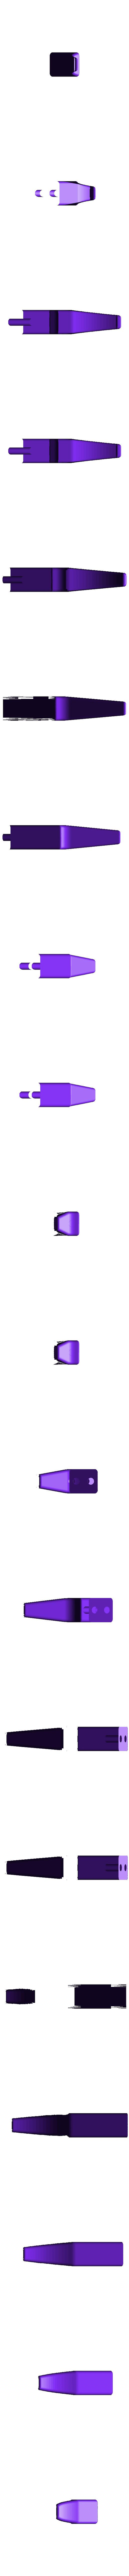 roller-handle.stl Download free STL file Heat Set Insert Press • 3D printer object, Adafruit